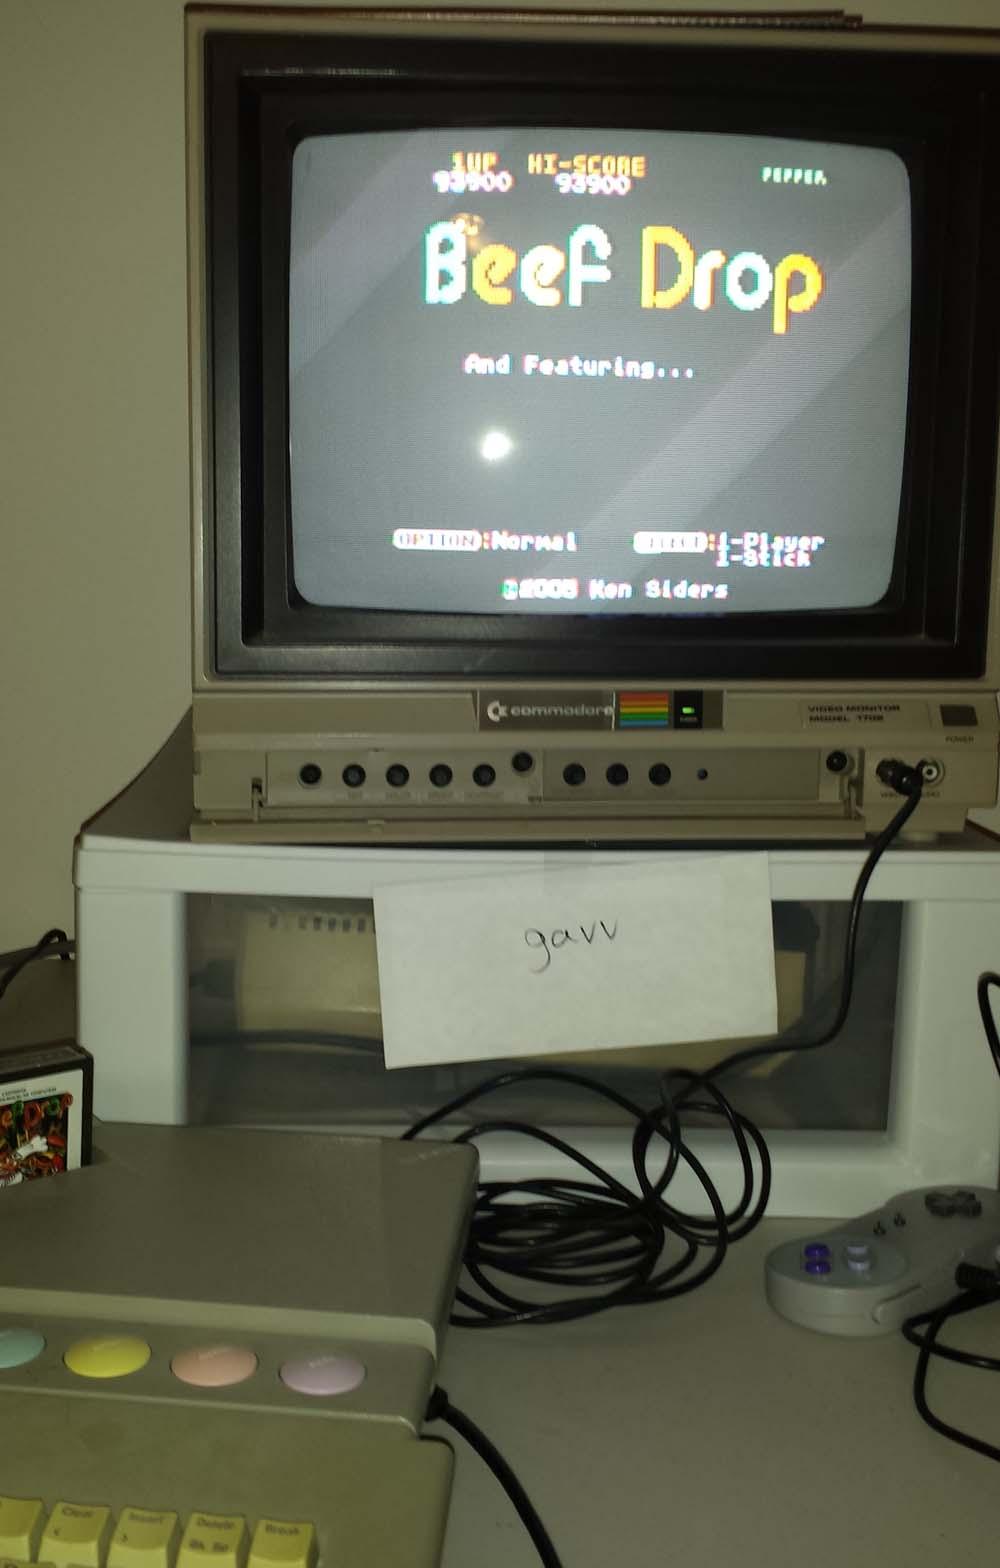 gavv: Beef Drop [Normal] (Atari 400/800/XL/XE) 93,900 points on 2014-10-28 21:14:49